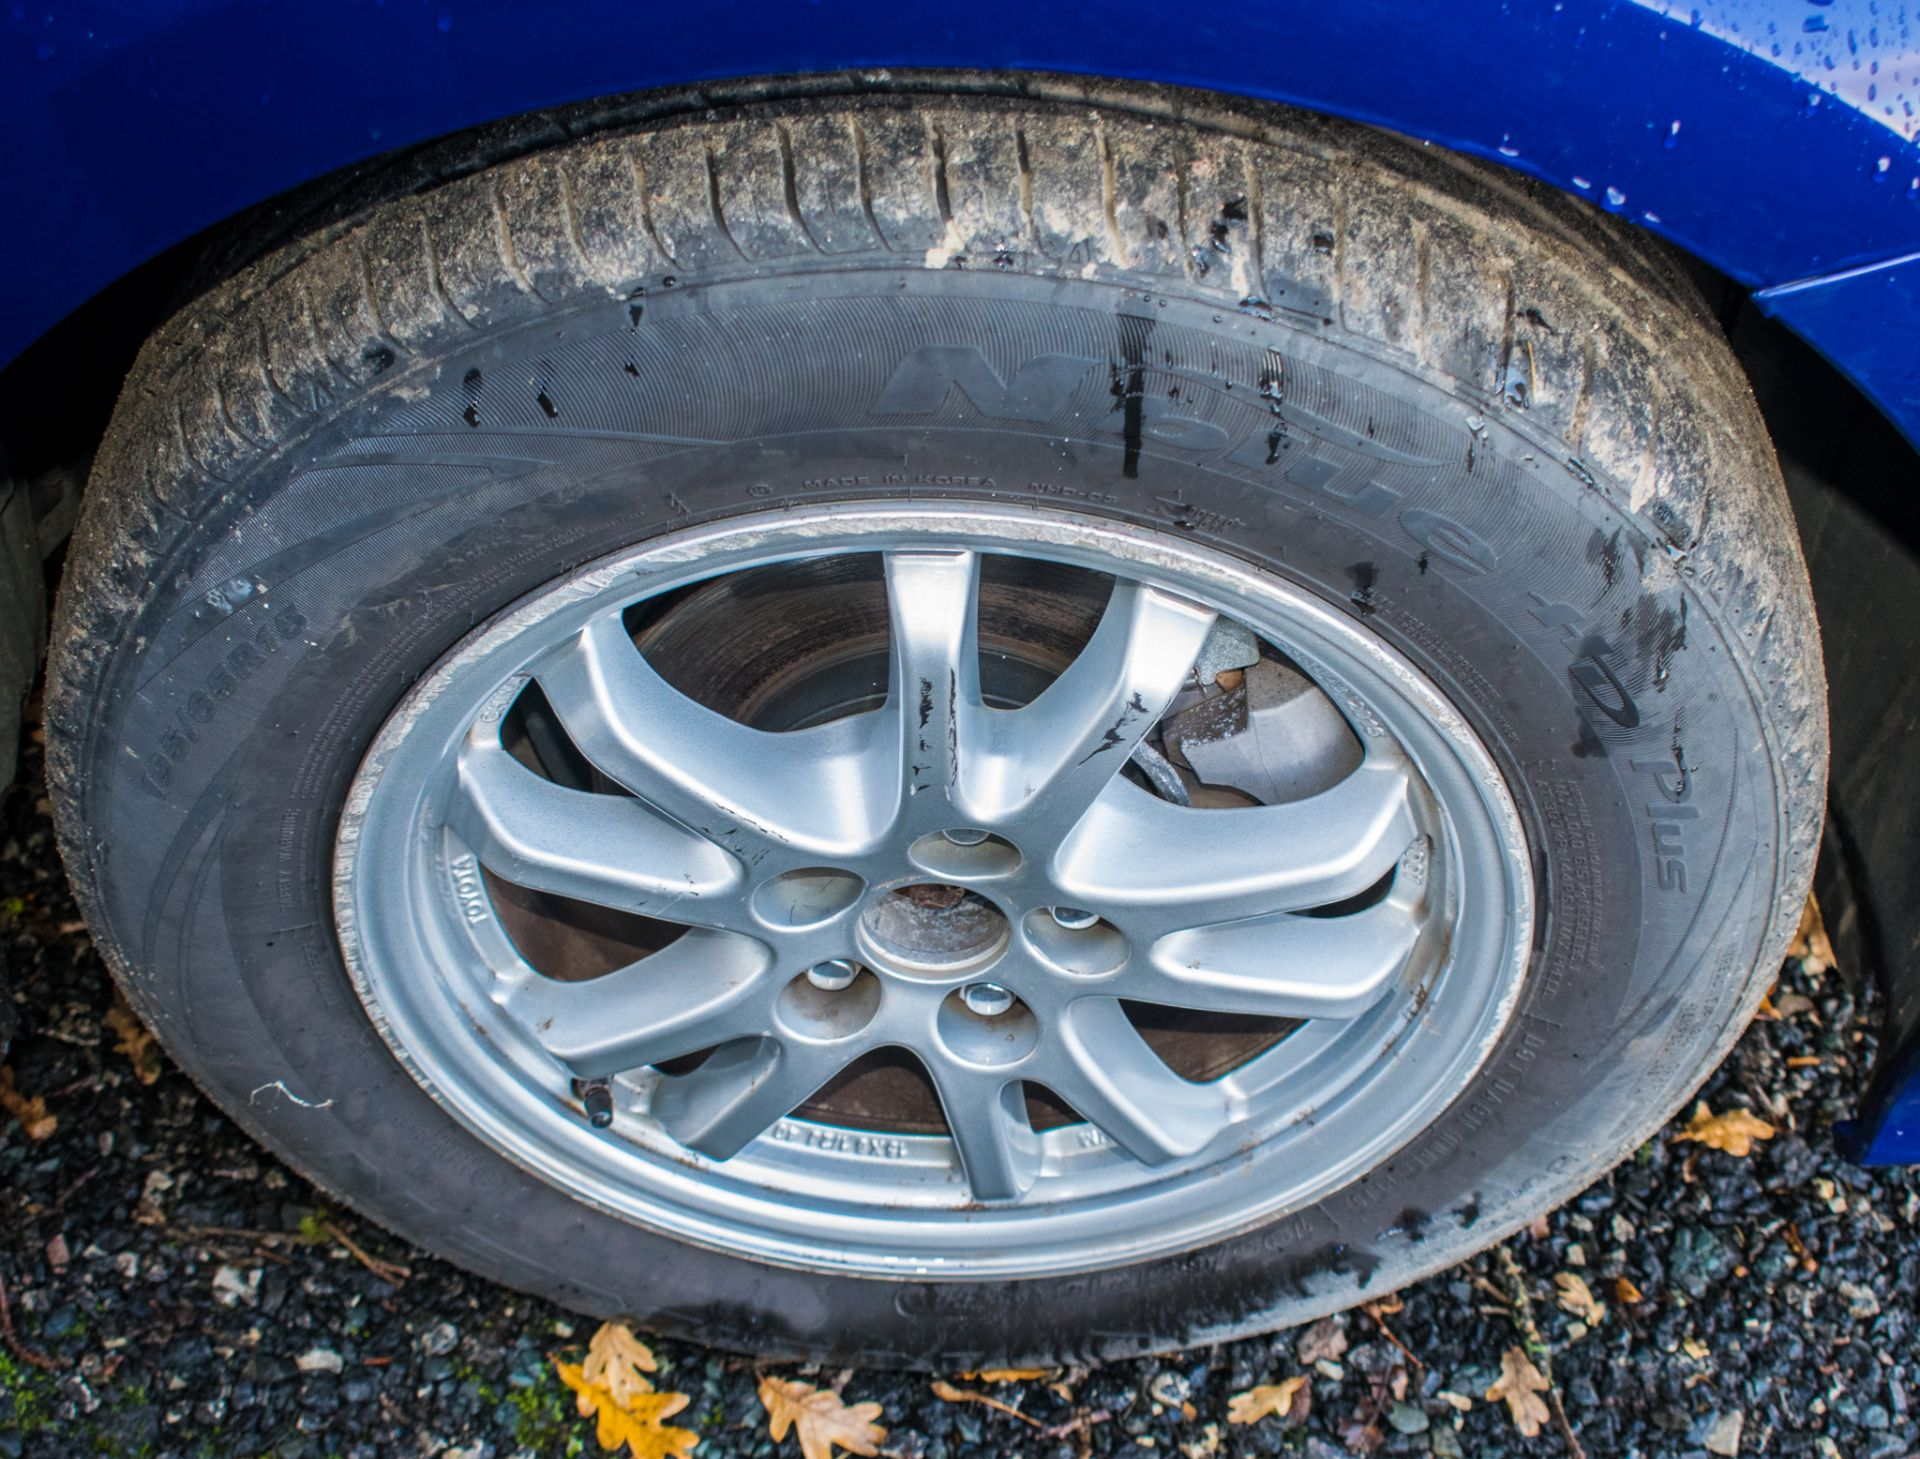 ToyotaPrius ActiveHybrid Electric 5 doorHatchback  Registration Number: LM67 OKH Date of First - Image 12 of 17